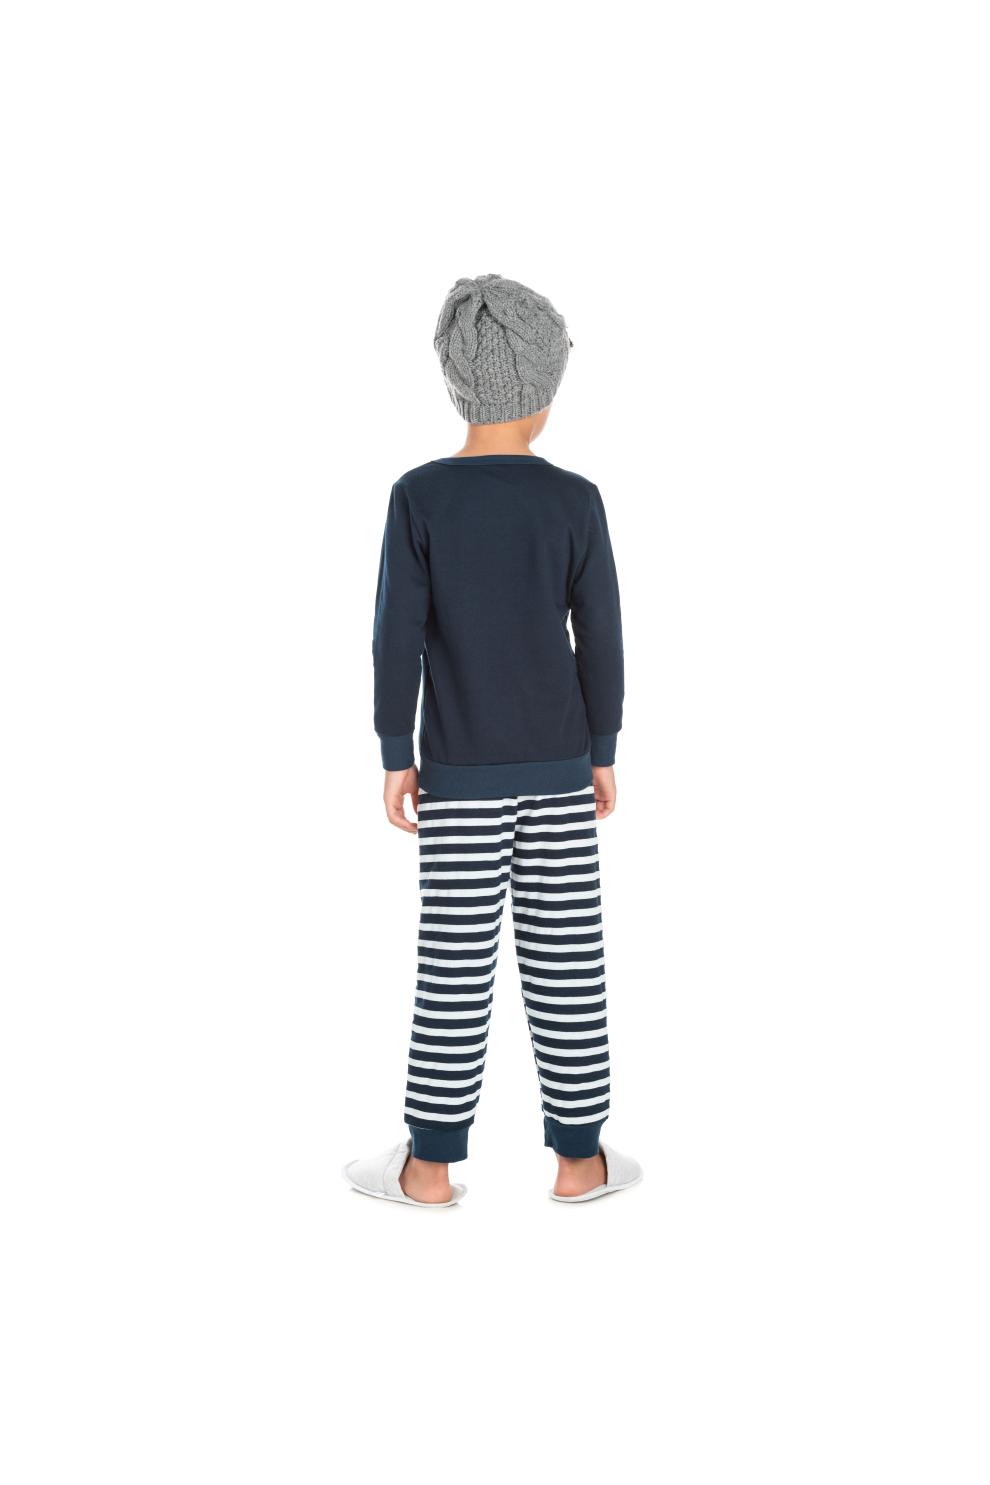 223/B - Pijama Infantil Masculino Cool Bear